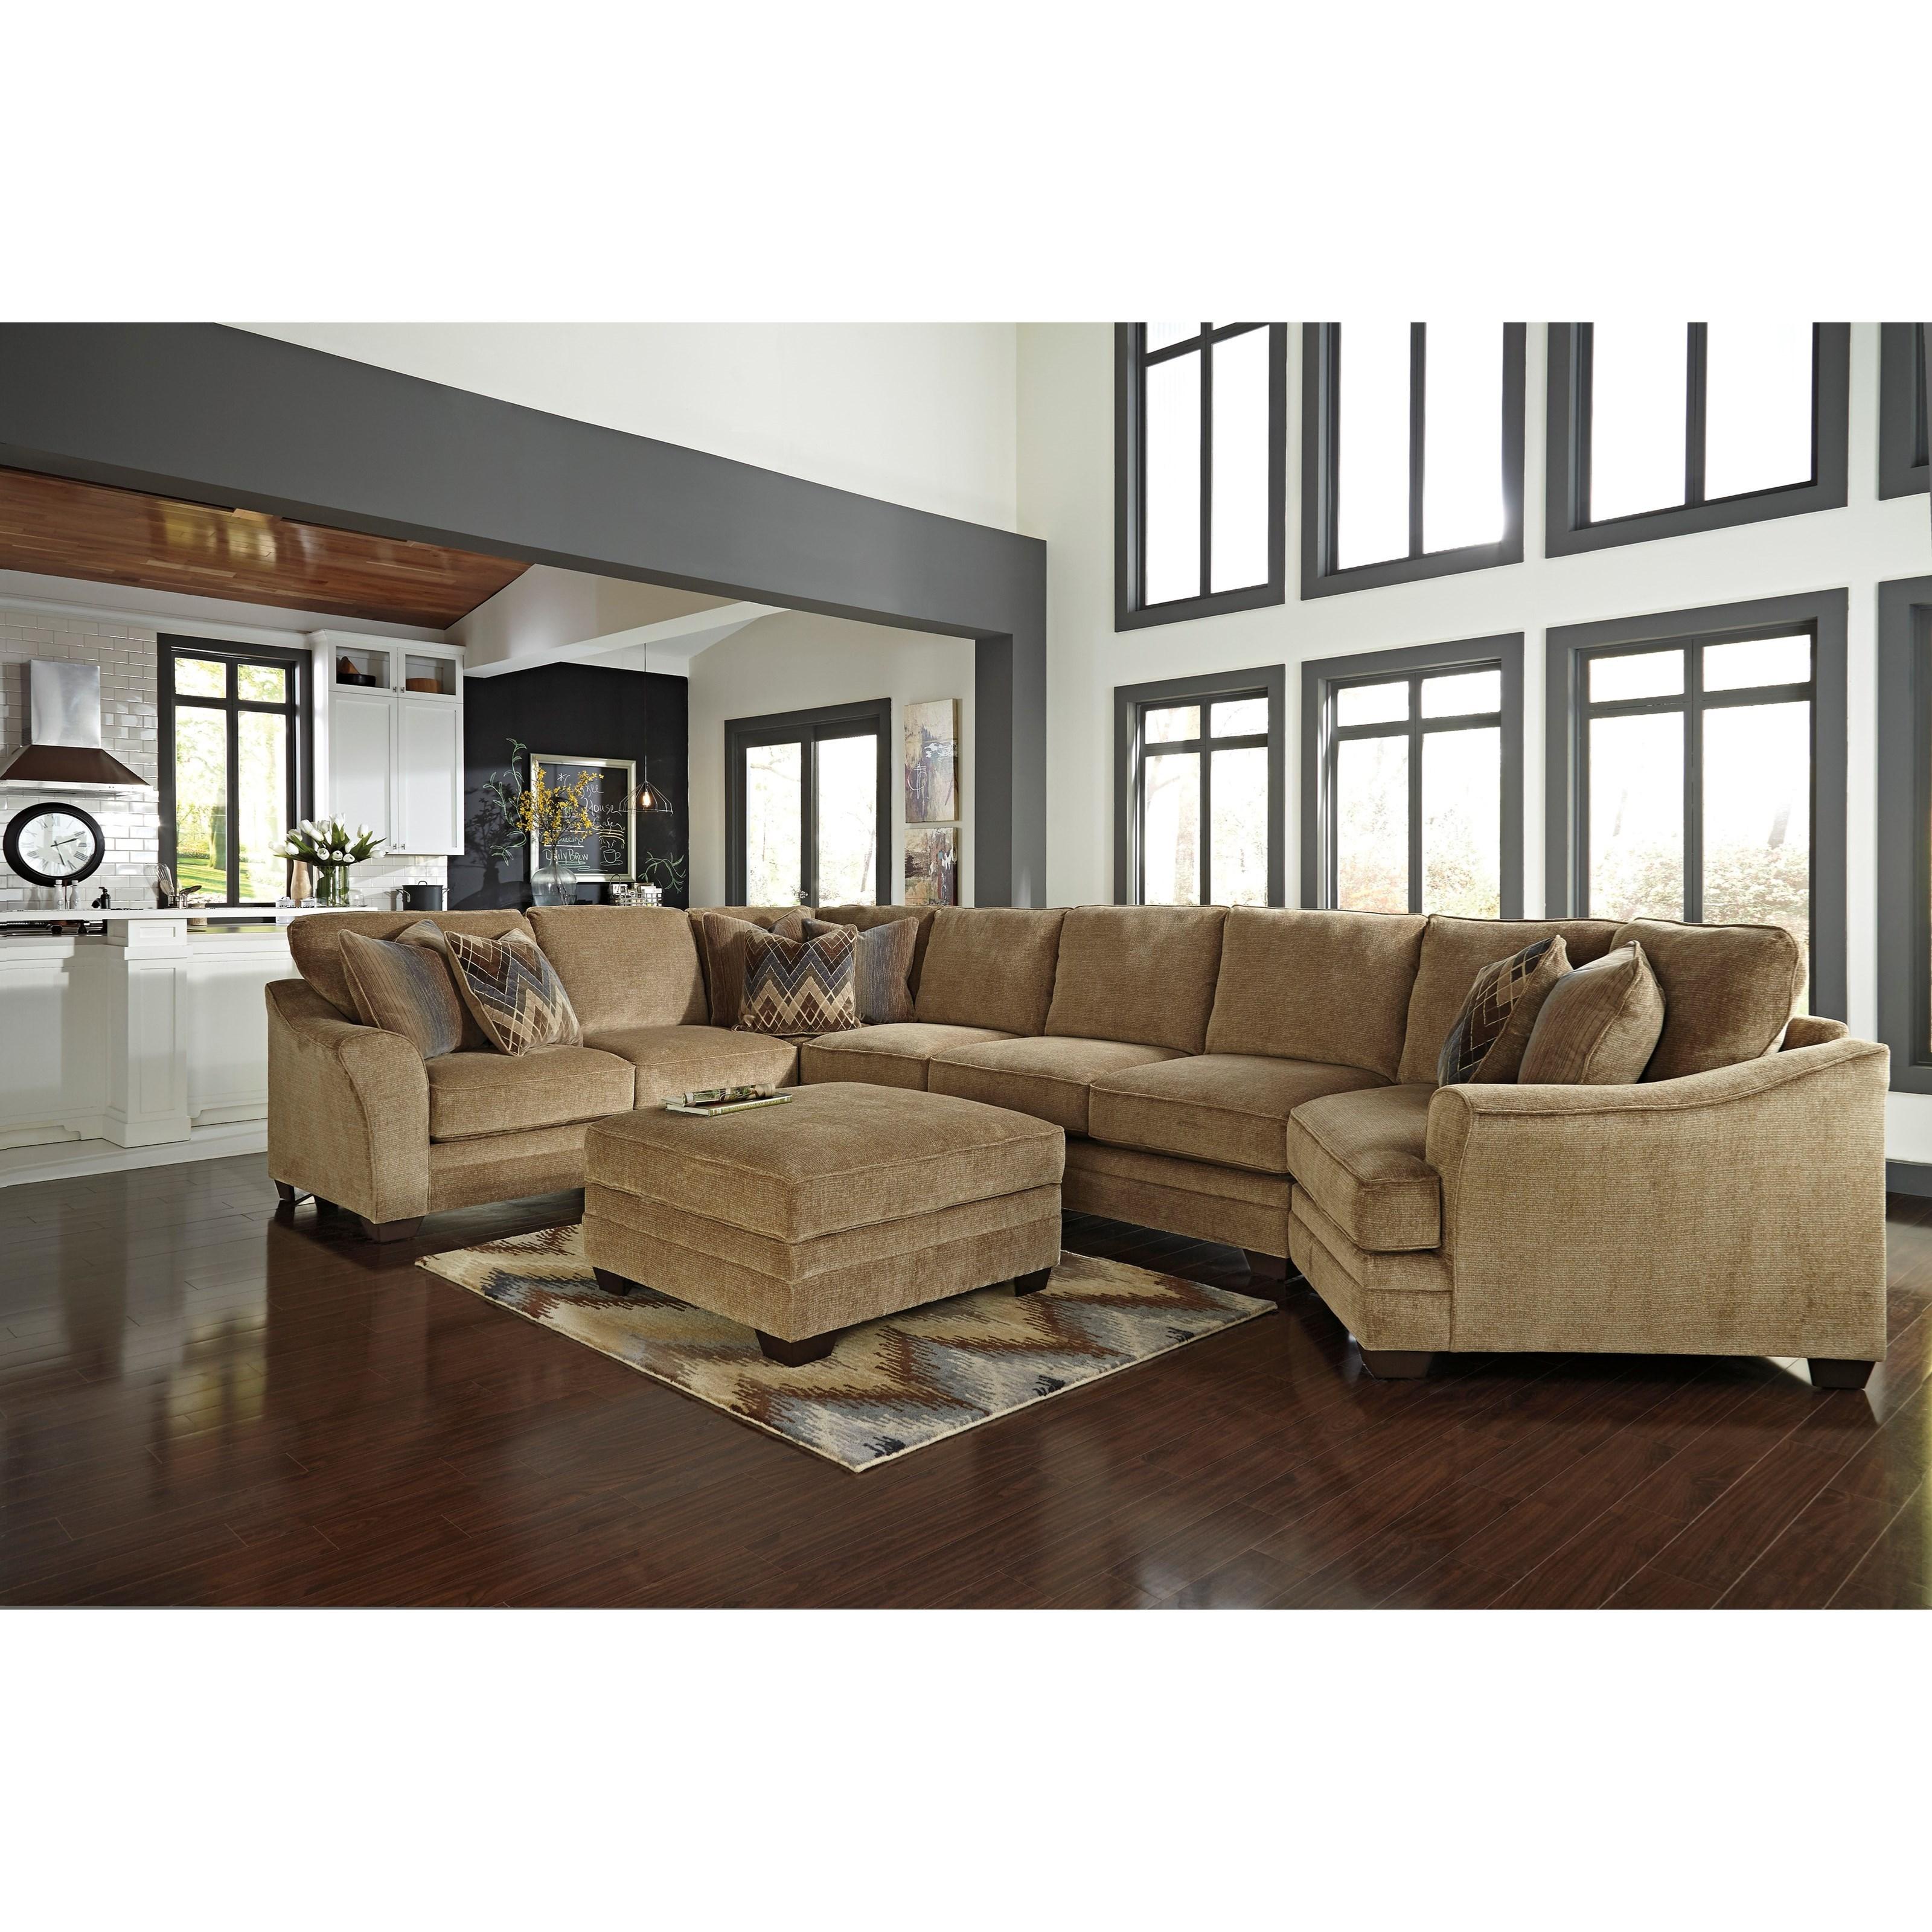 Ashley/Benchcraft Lonsdale Stationary Living Room Group - Item Number: 92111 Living Room Group 8